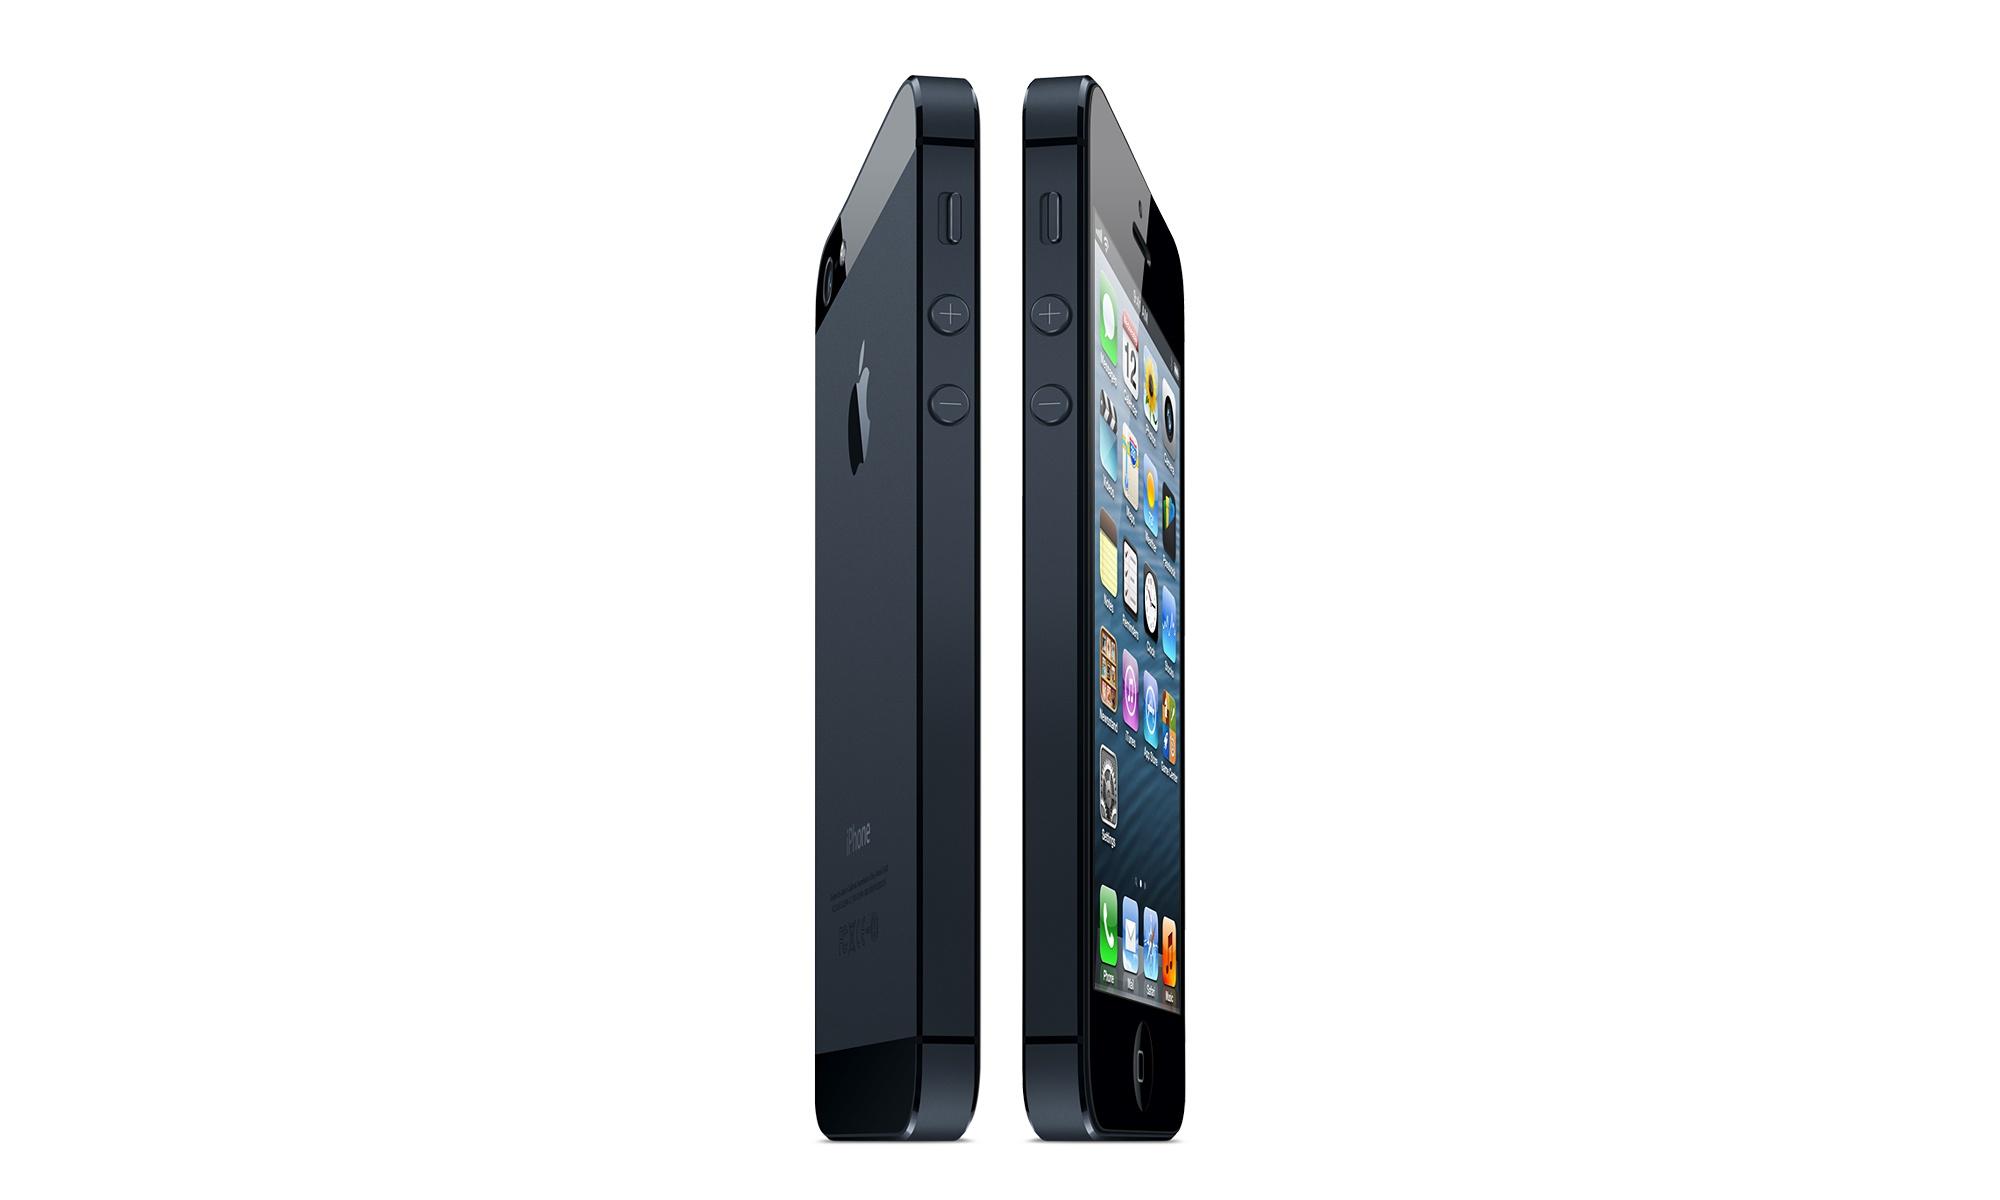 Обои iphone 3gs 16gb gebraucht schwarz - fbf4b